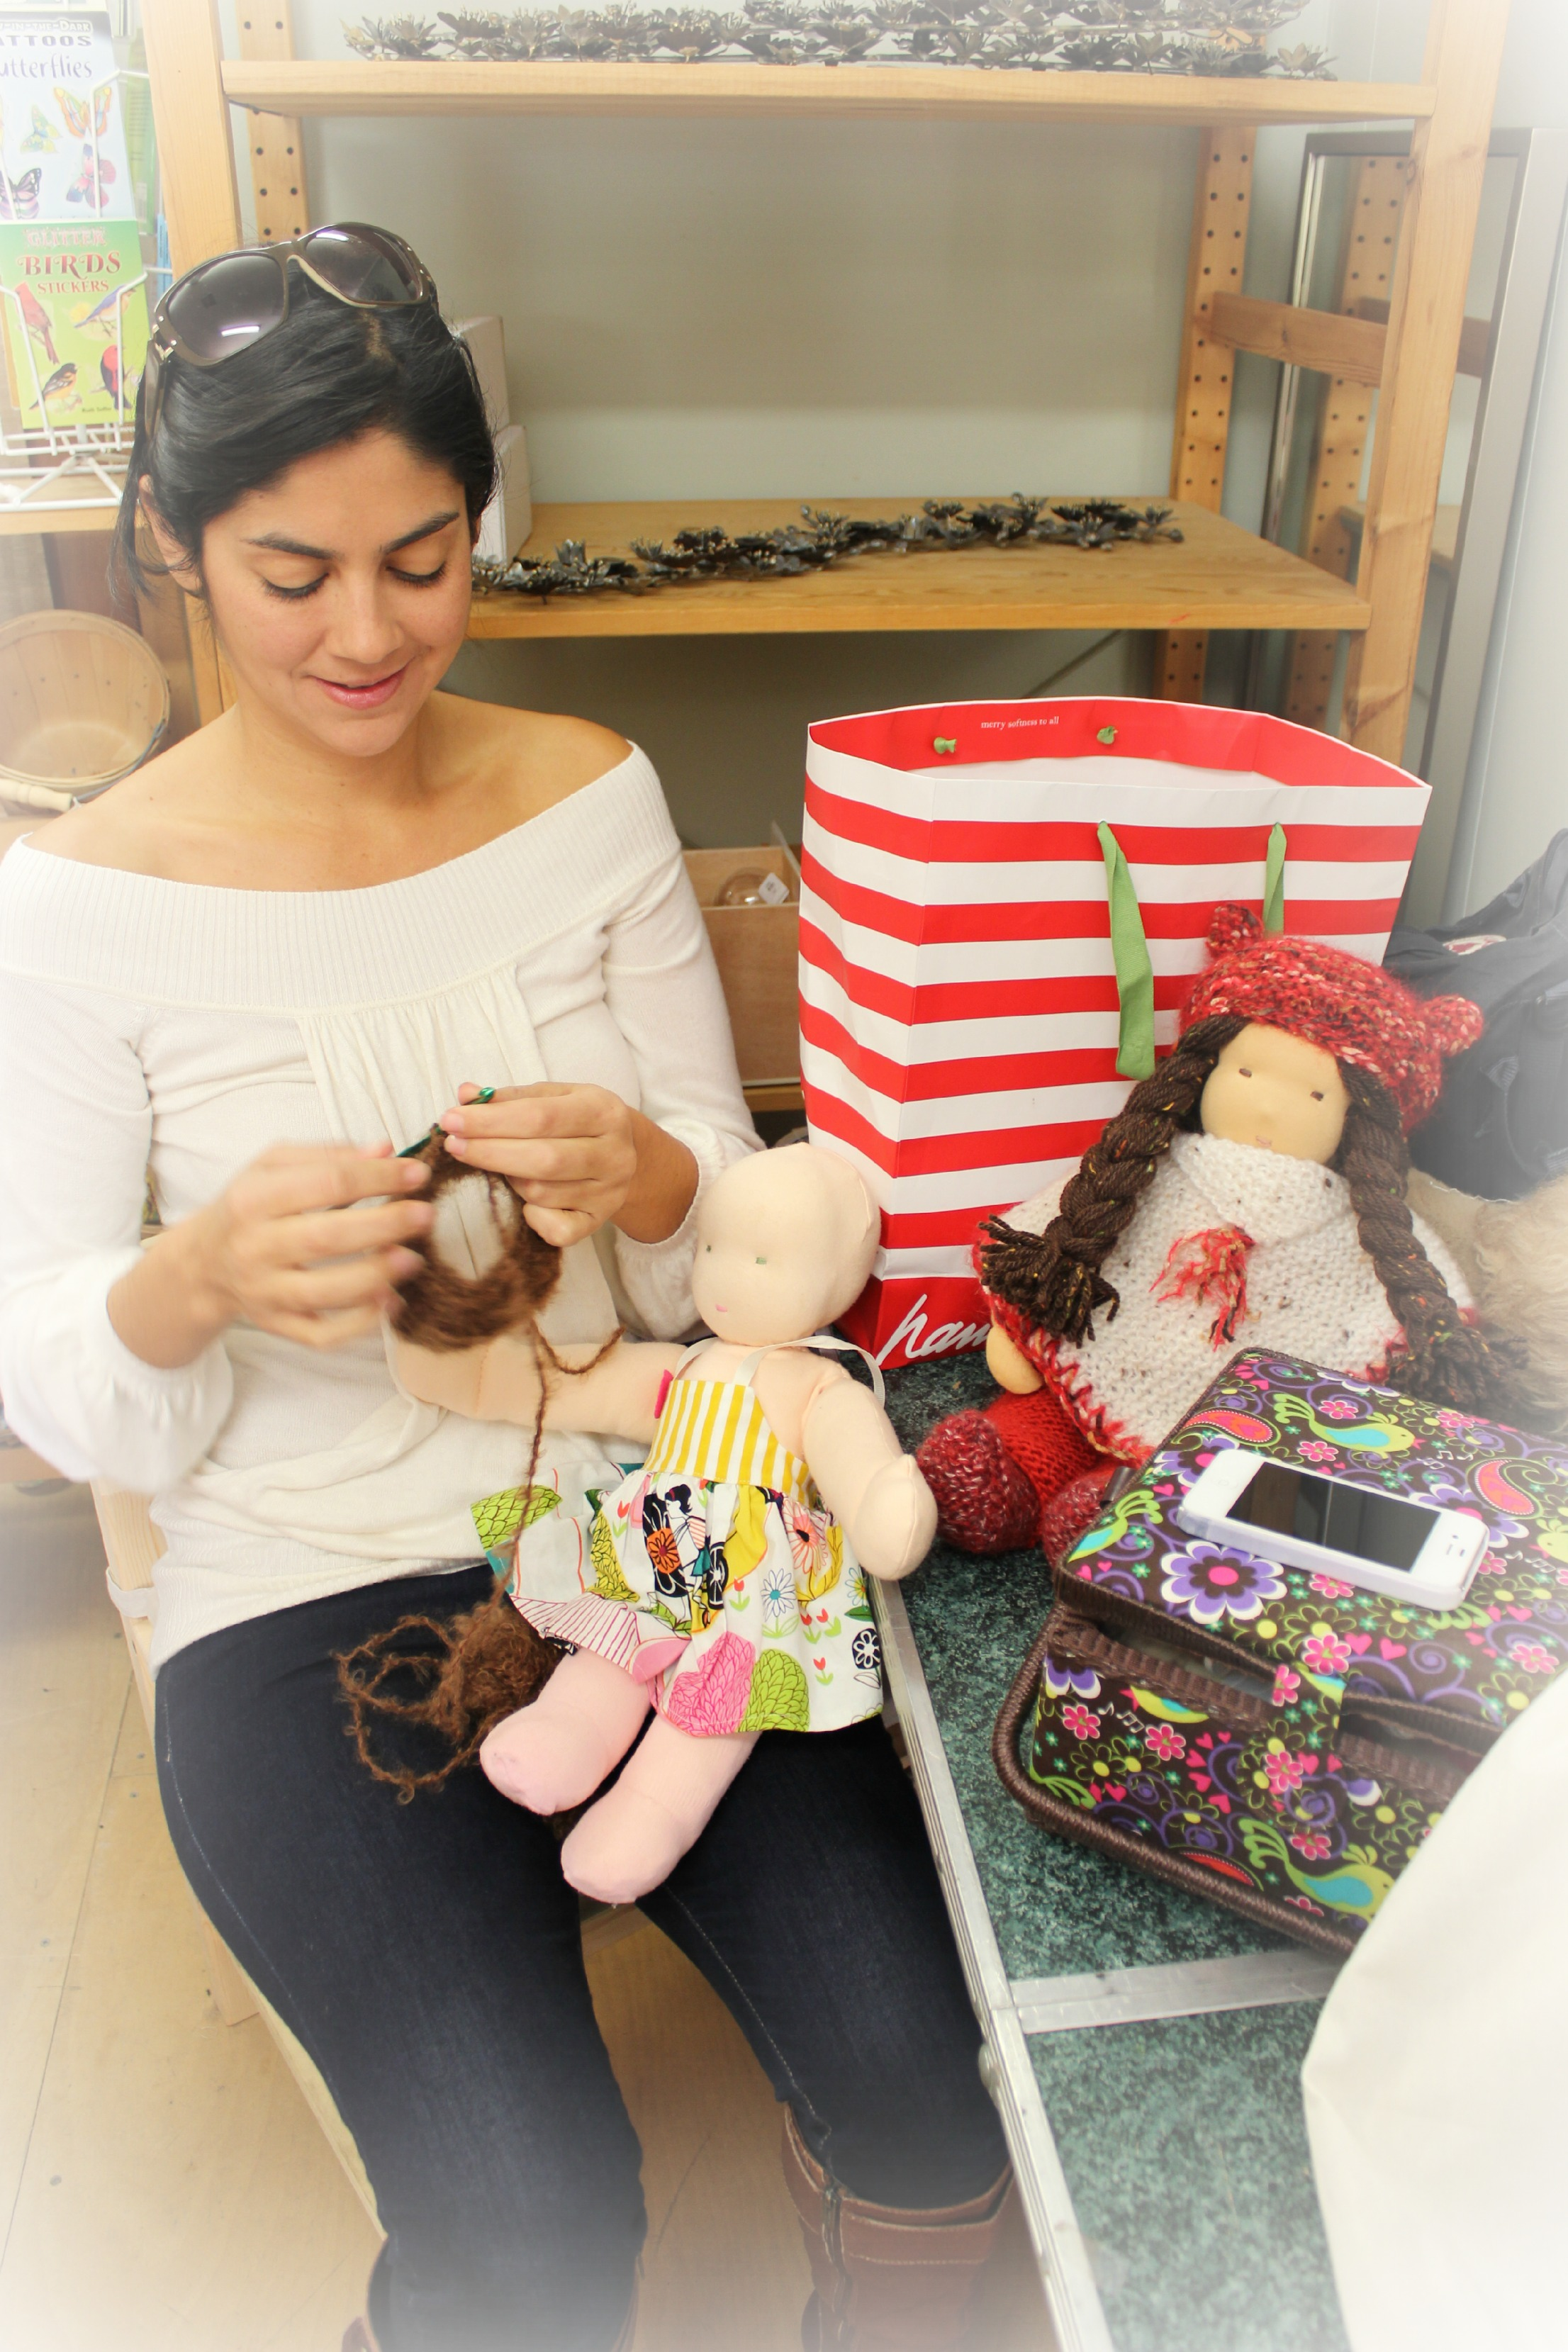 121219 Yvonne crafting 16 inch Waldorf cuddle dolls for her children